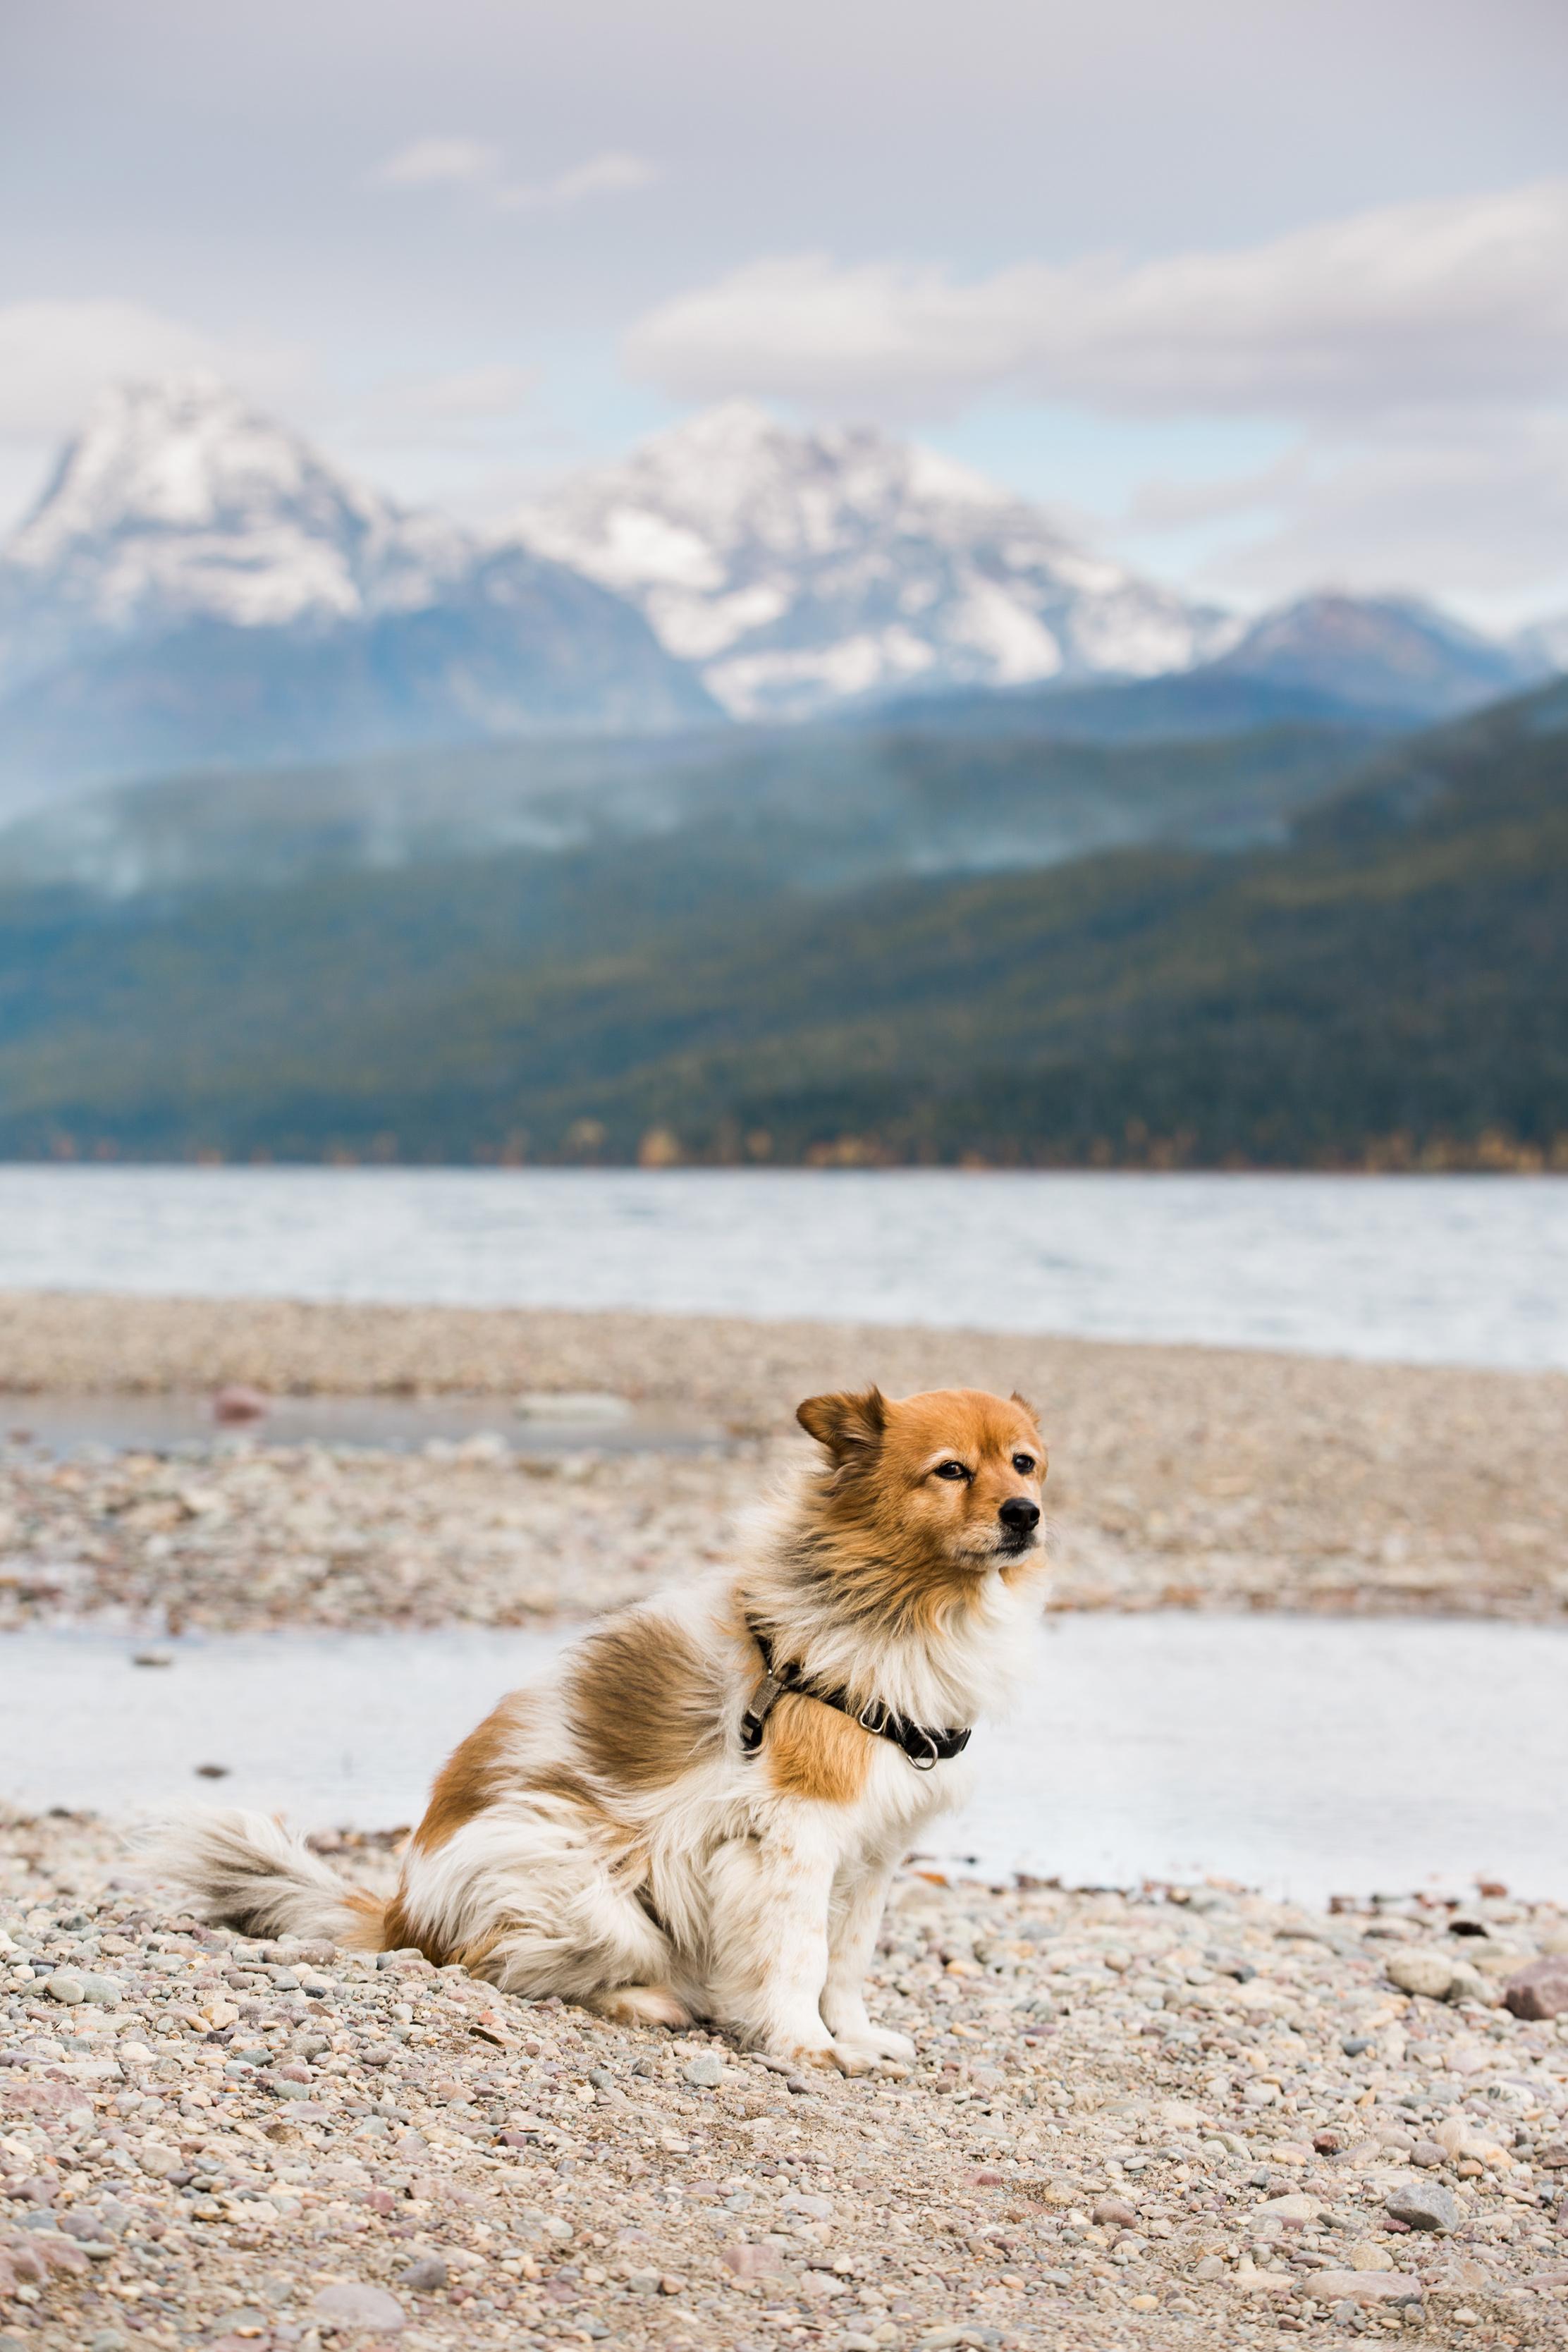 CindyGiovagnoli_outdoor_adventure_photography_Grand_Teton_Yellowstone_Glacier_National_Park_Montana_Wyoming_South_Dakota_Mount_Rushmore_Badlands-019.jpg